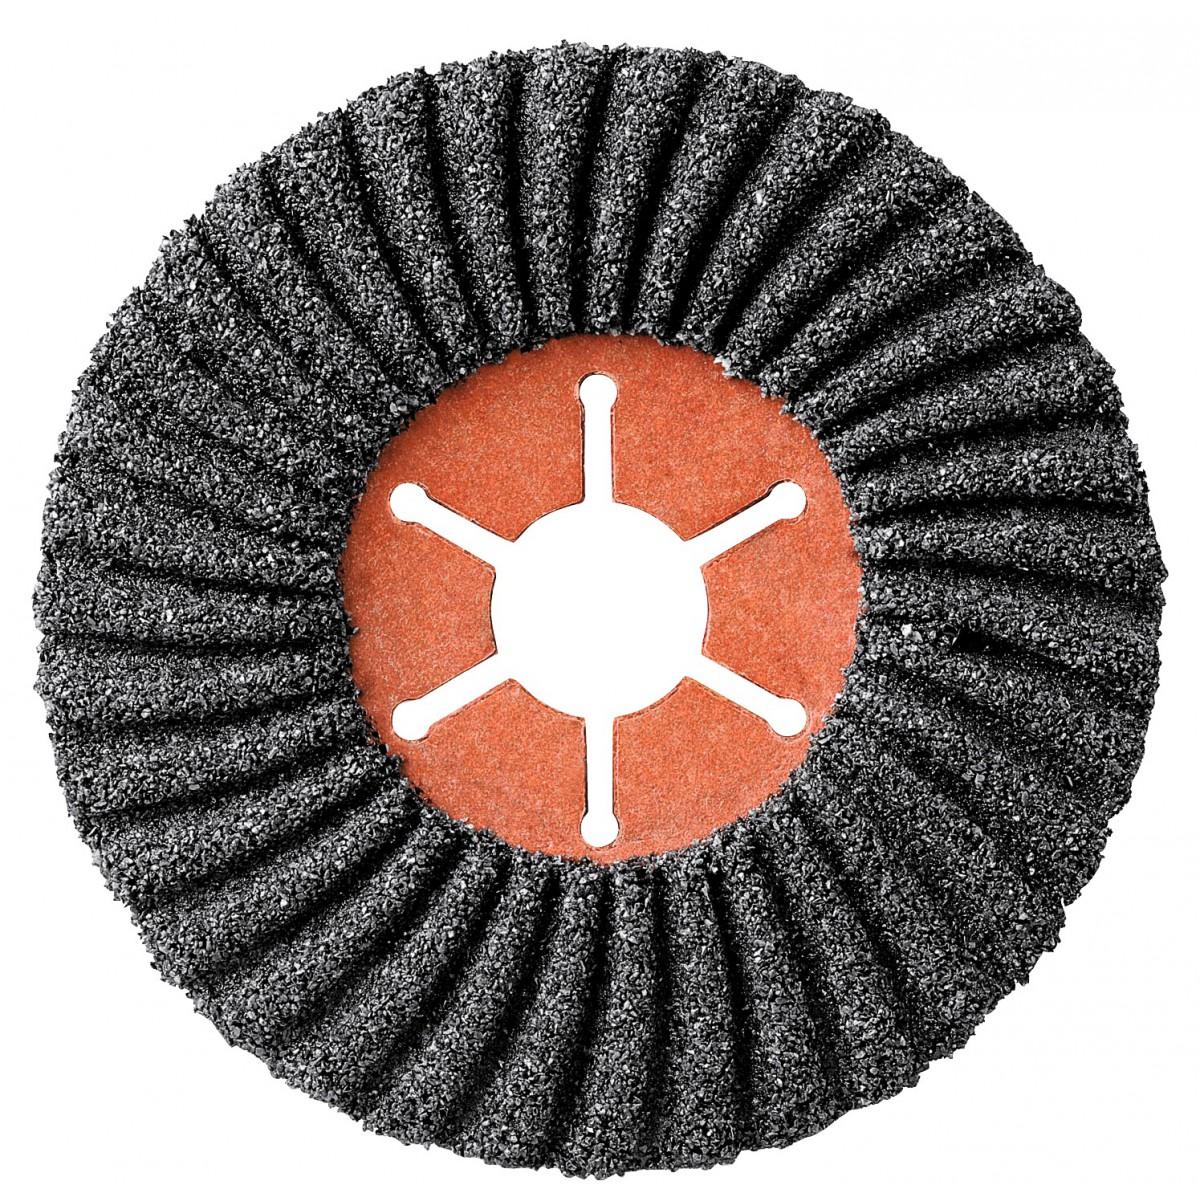 Disque semiflexible carbure de silicium diamètre 115 x 22 mm SCID - Grain 60